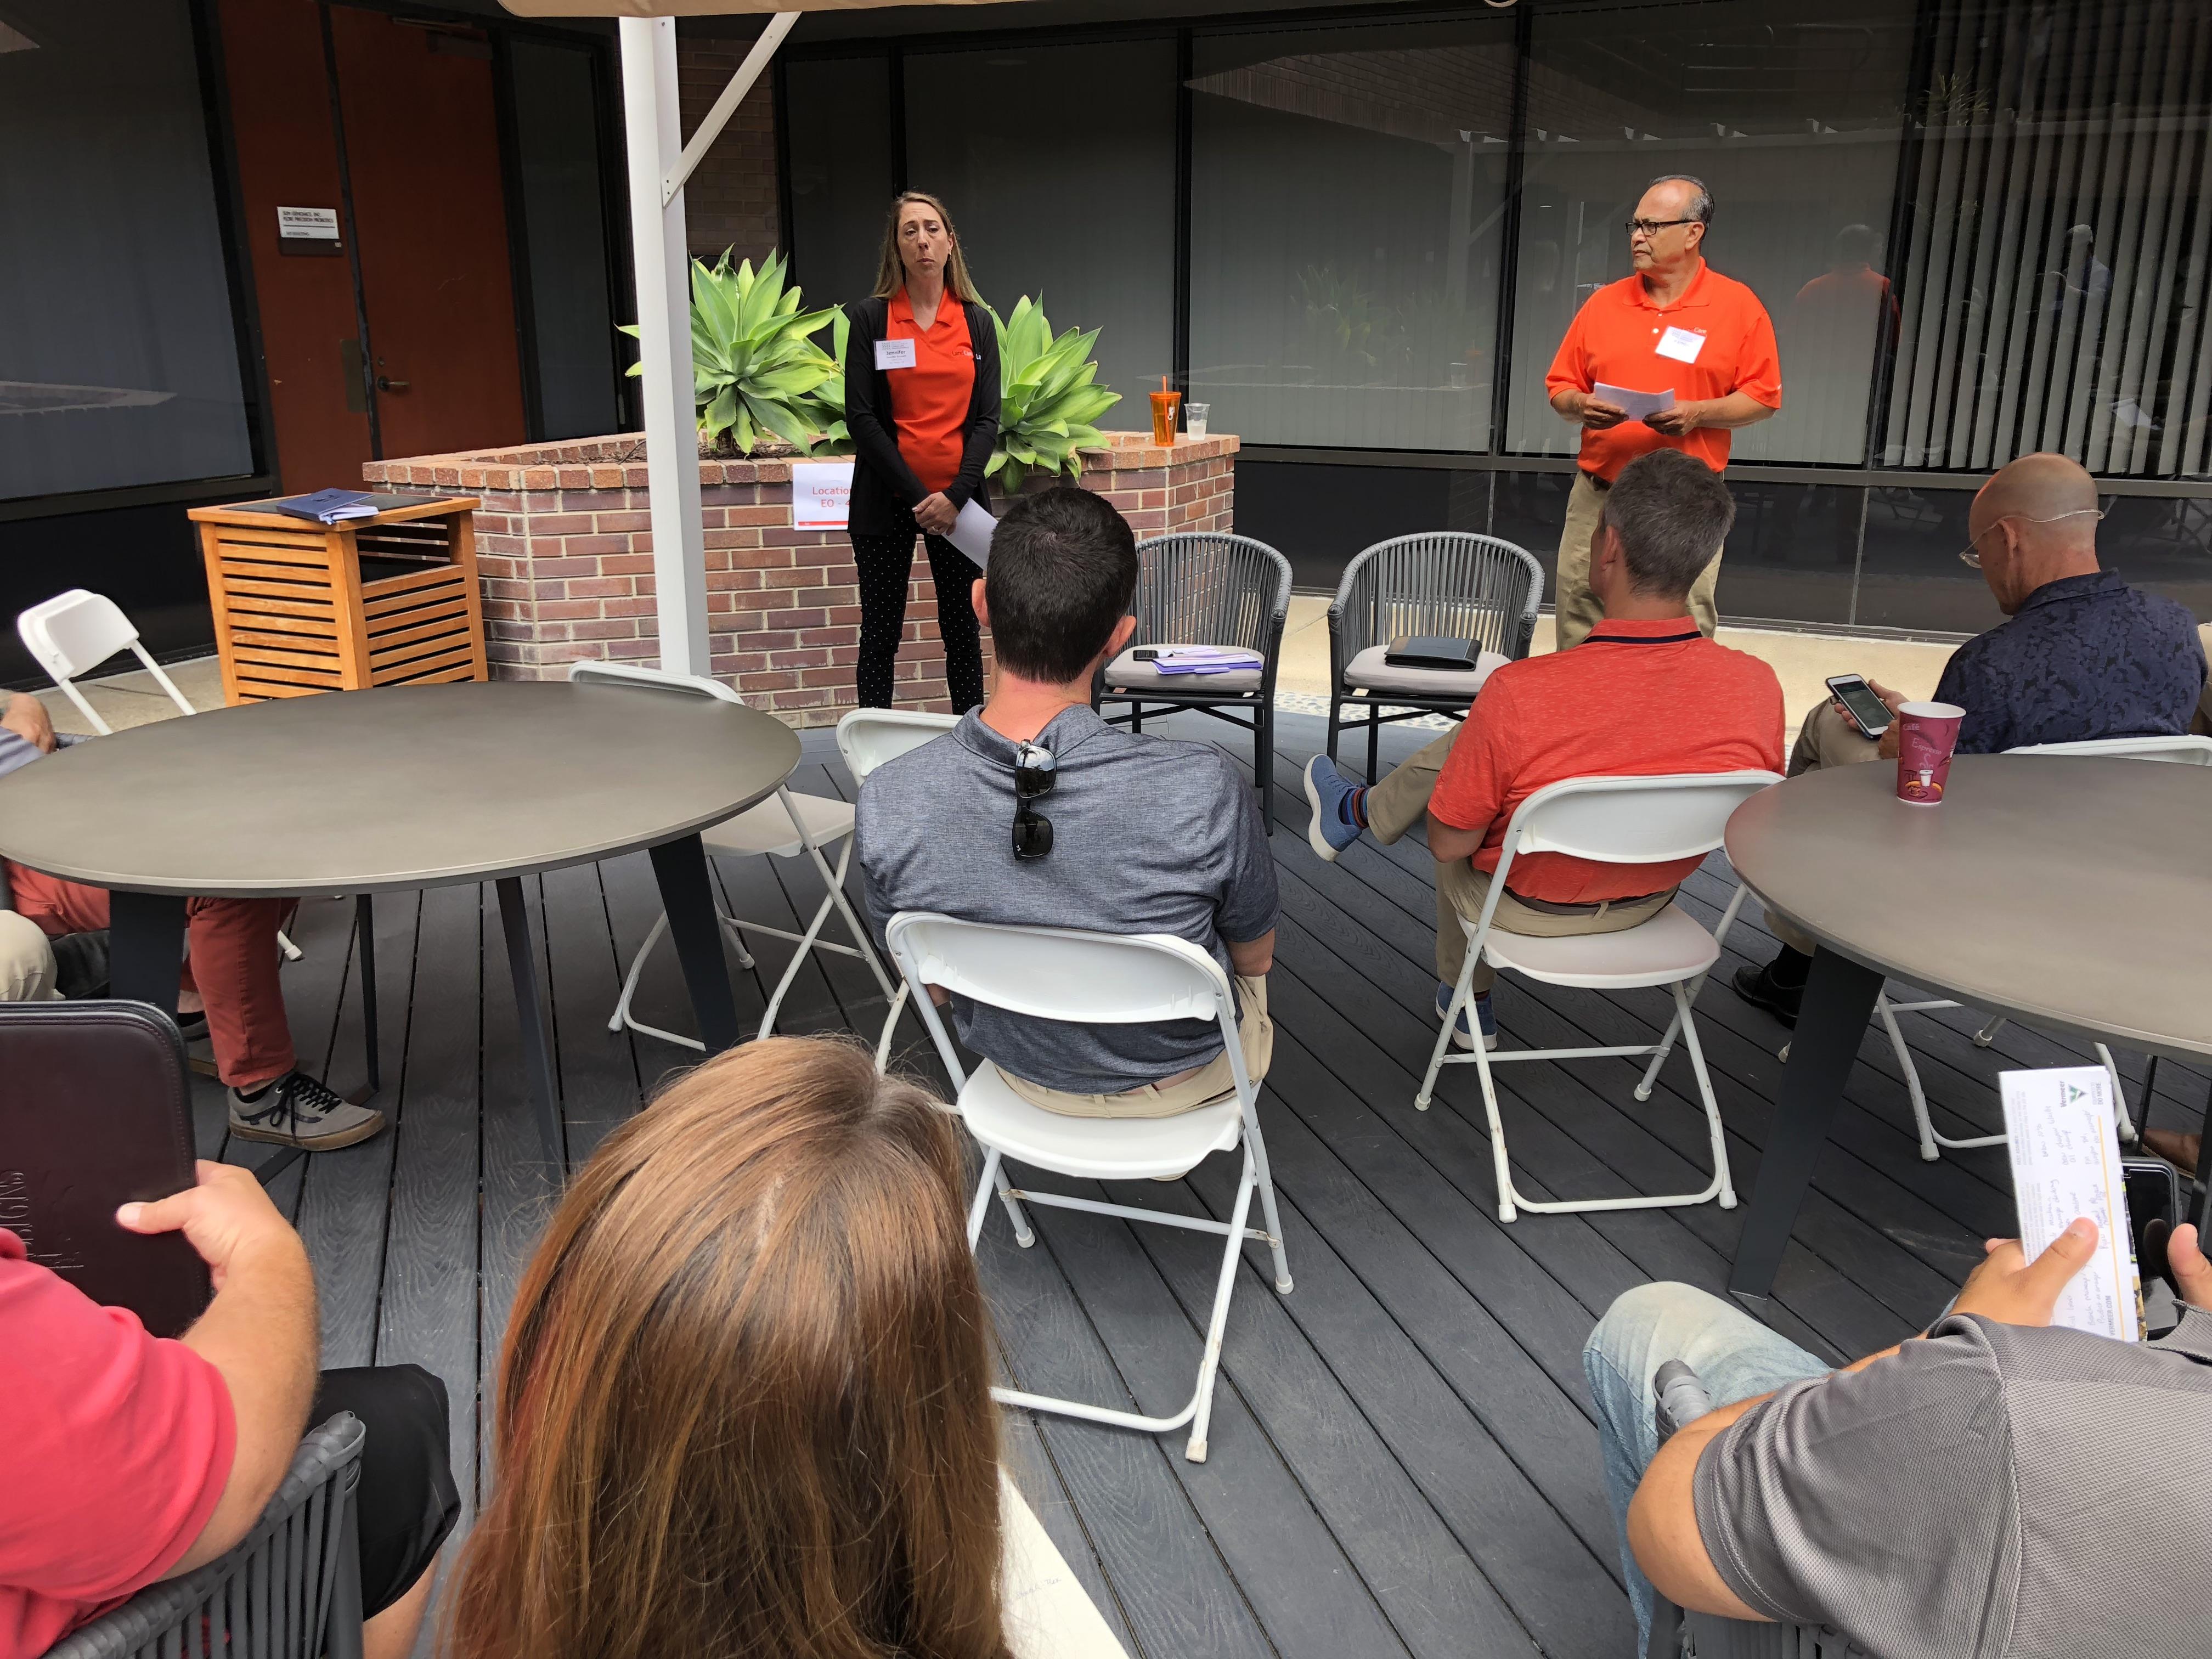 Jennifer Burnett and Ramon Ulloa discuss training and development of LandCare's employees. (Photo: Seth Jones)